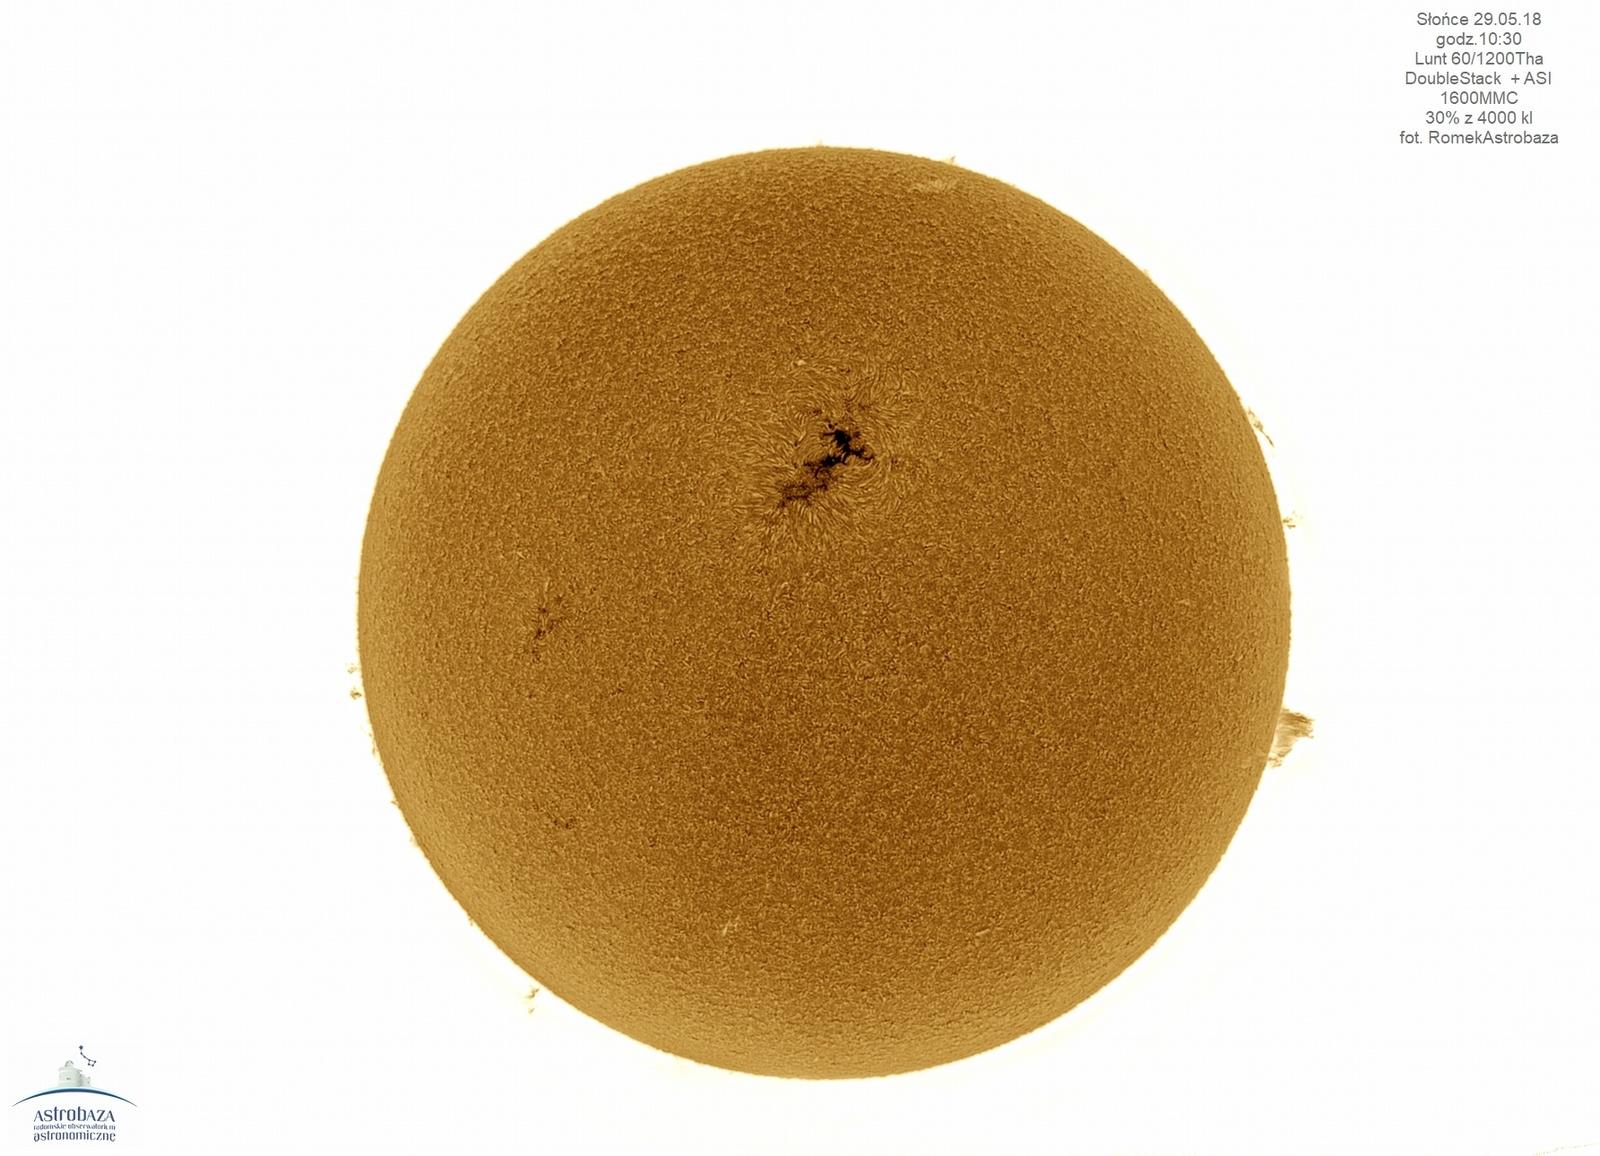 sun29abc.jpg